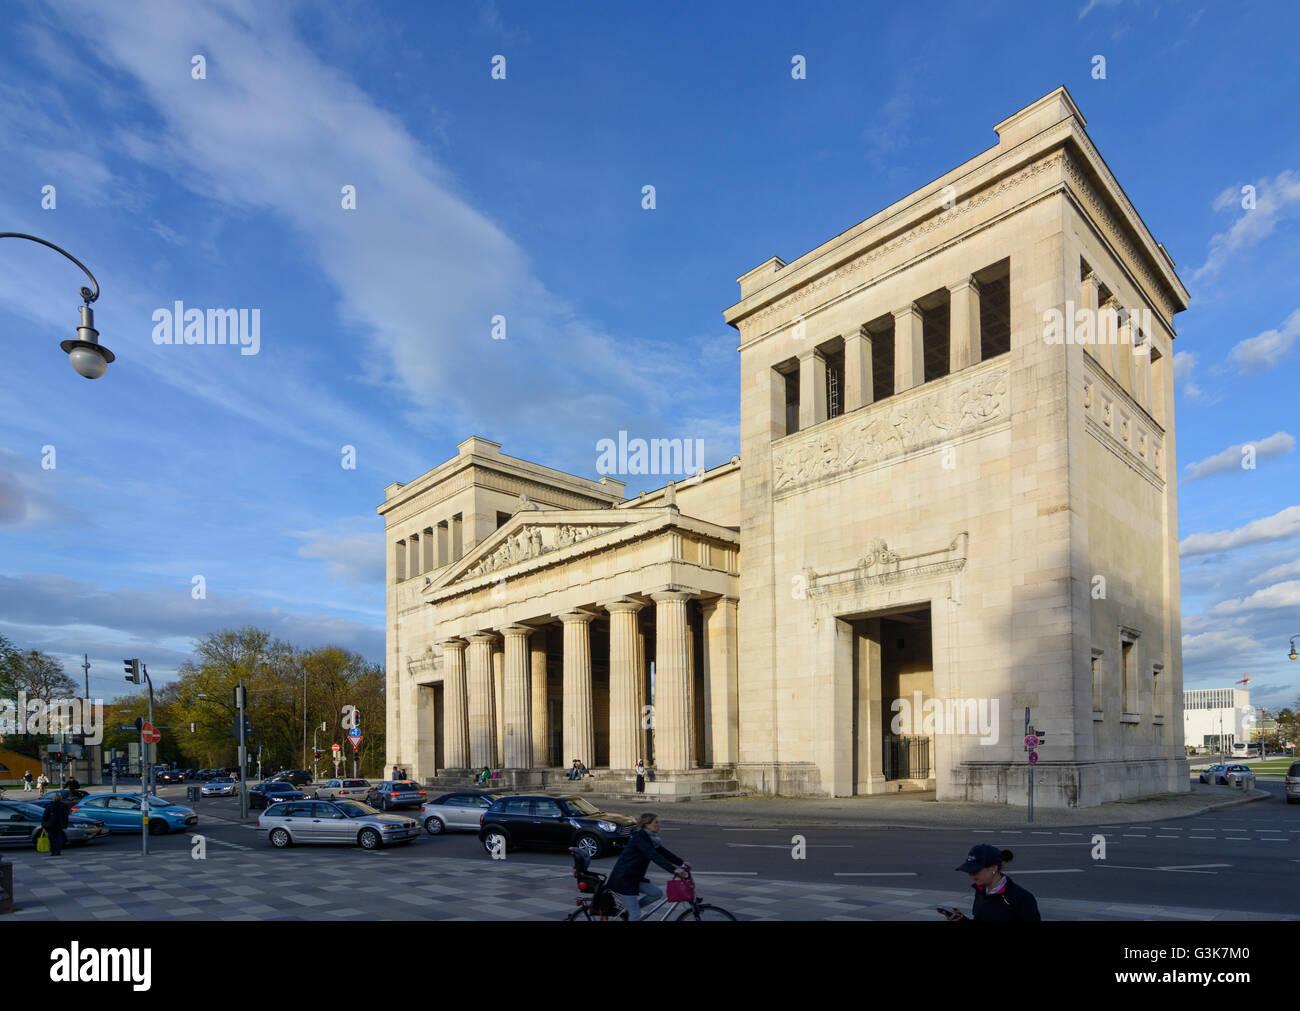 Königsplatz with the Propylaea, Germany, Bayern, Bavaria, Oberbayern, Upper Bavaria, München, Munich - Stock Image